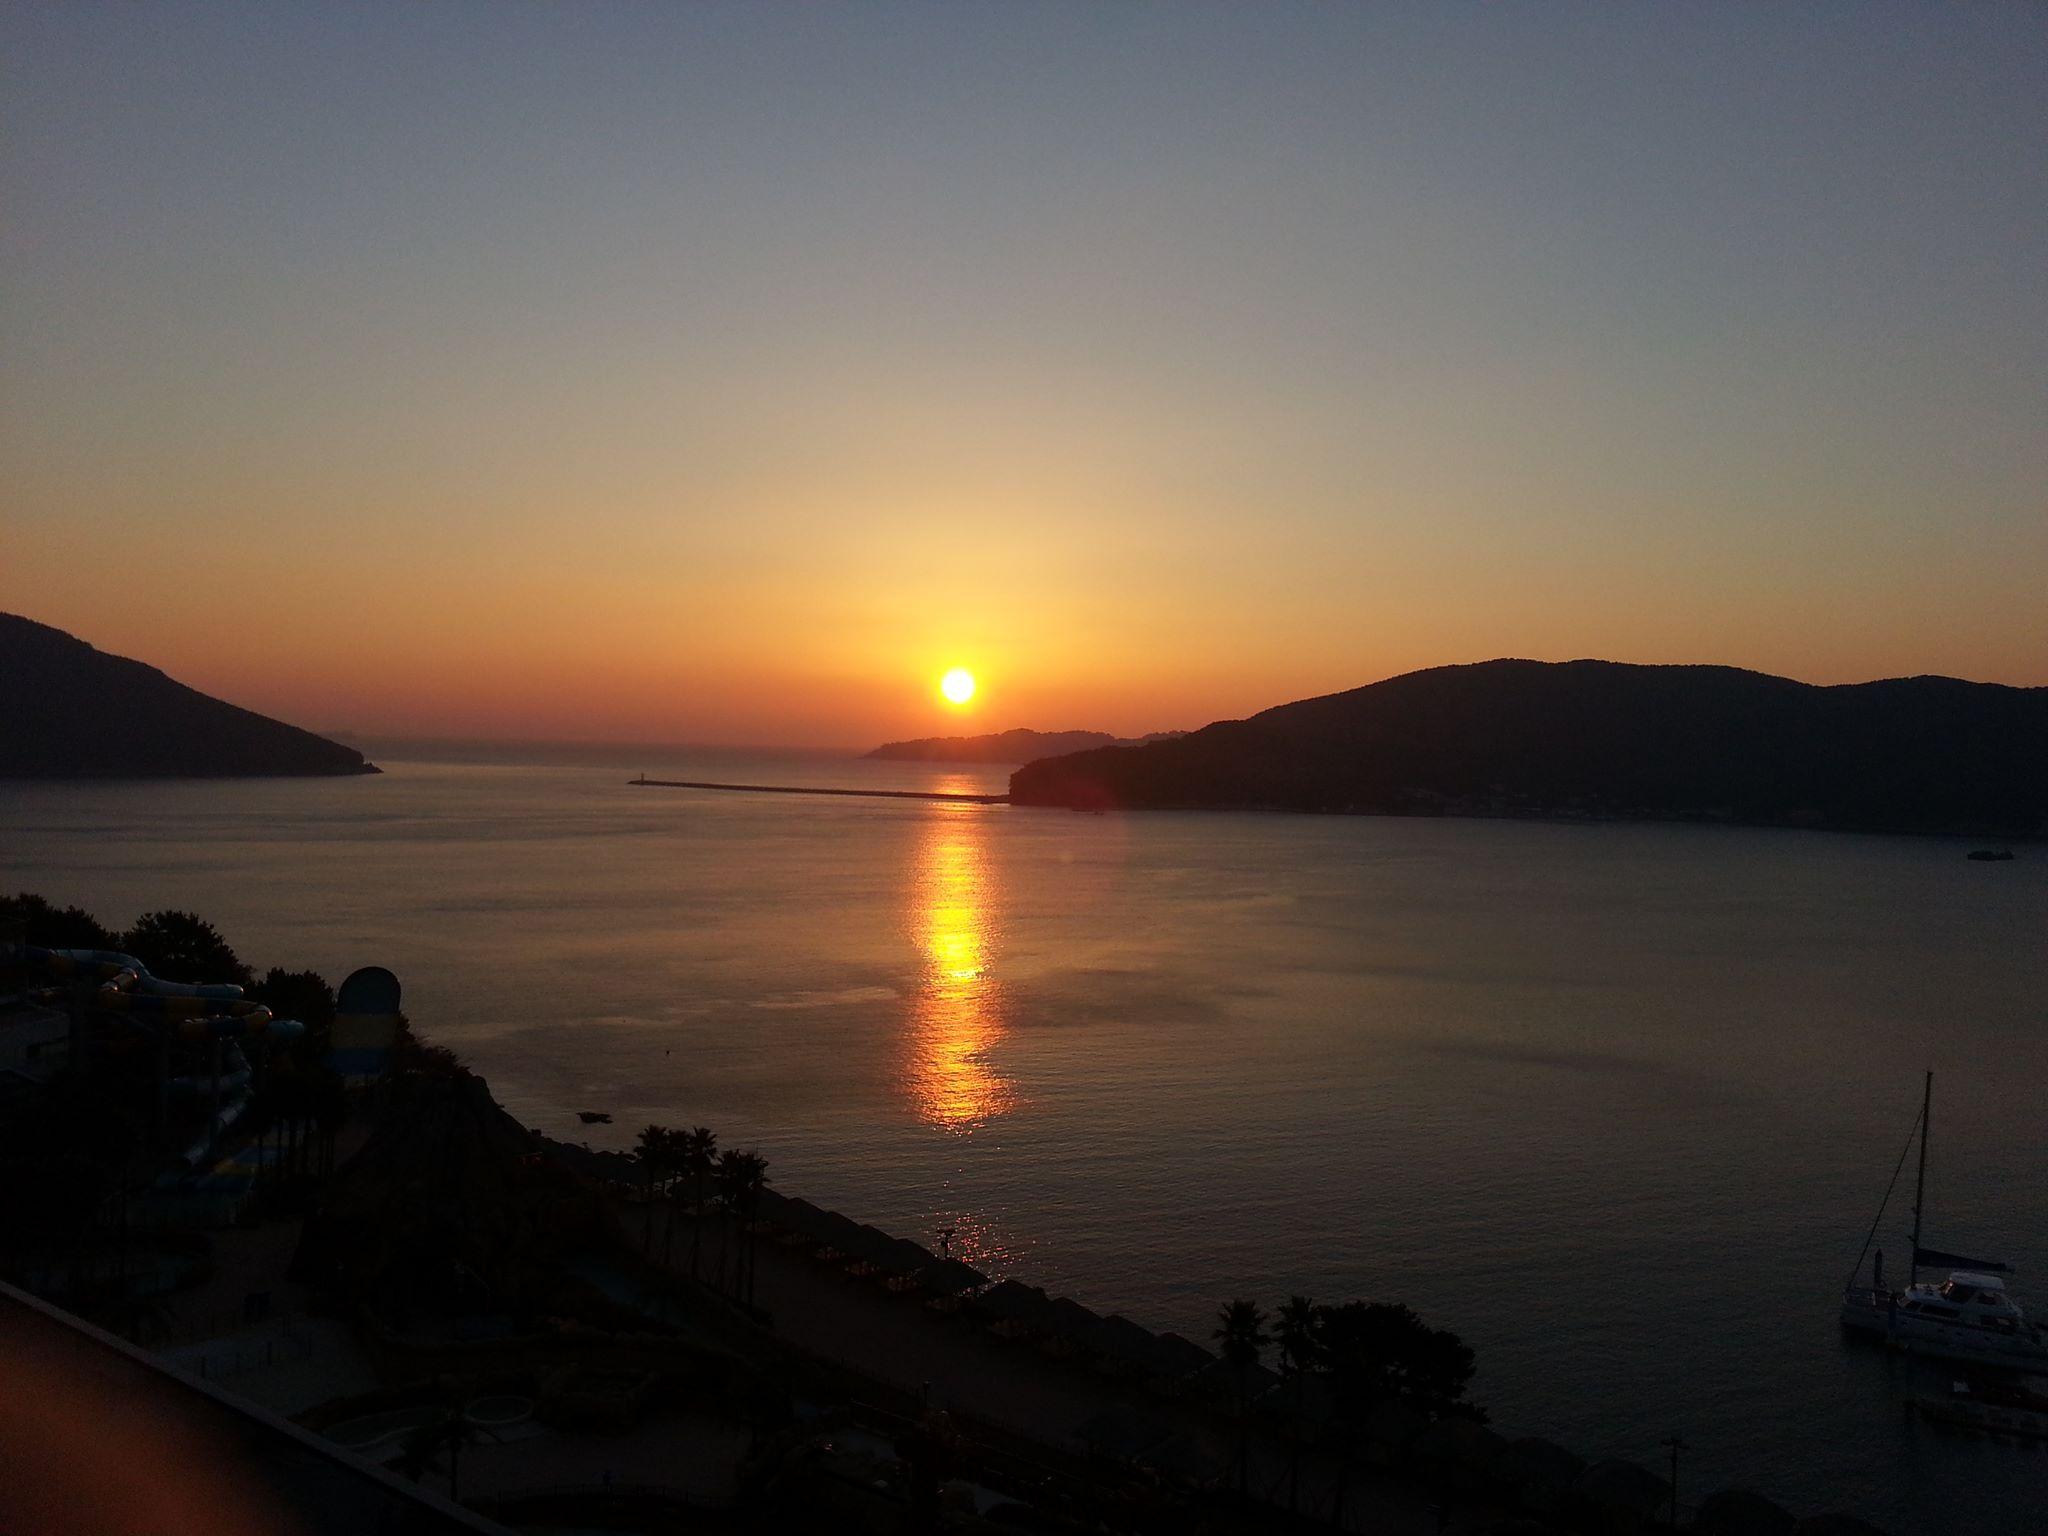 Рассвет на острове Годжедо, Ю.Корея